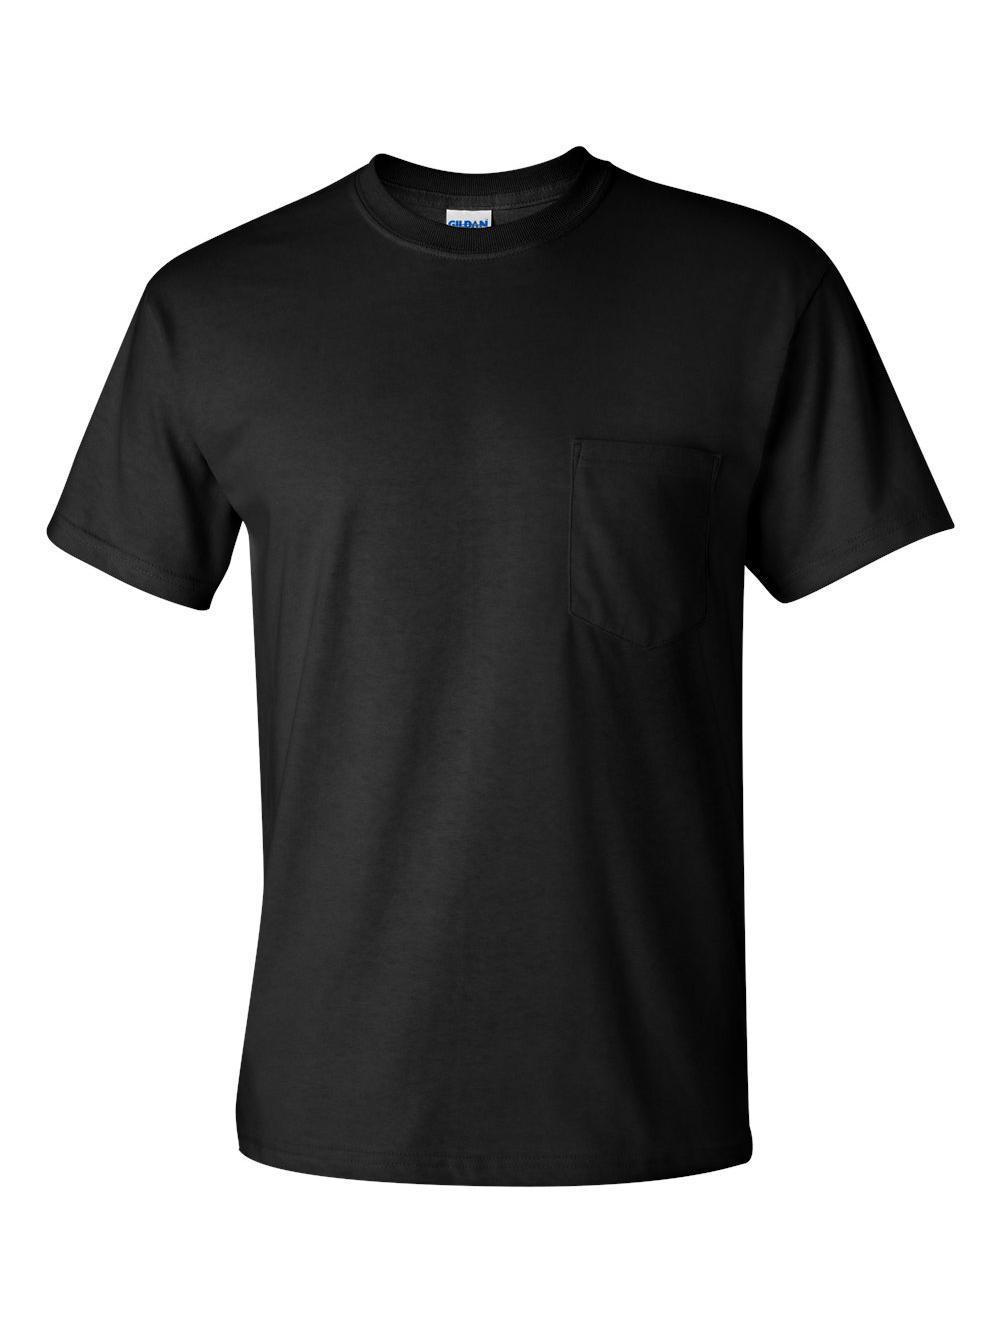 Gildan-Ultra-Cotton-T-Shirt-with-a-Pocket-2300 thumbnail 6